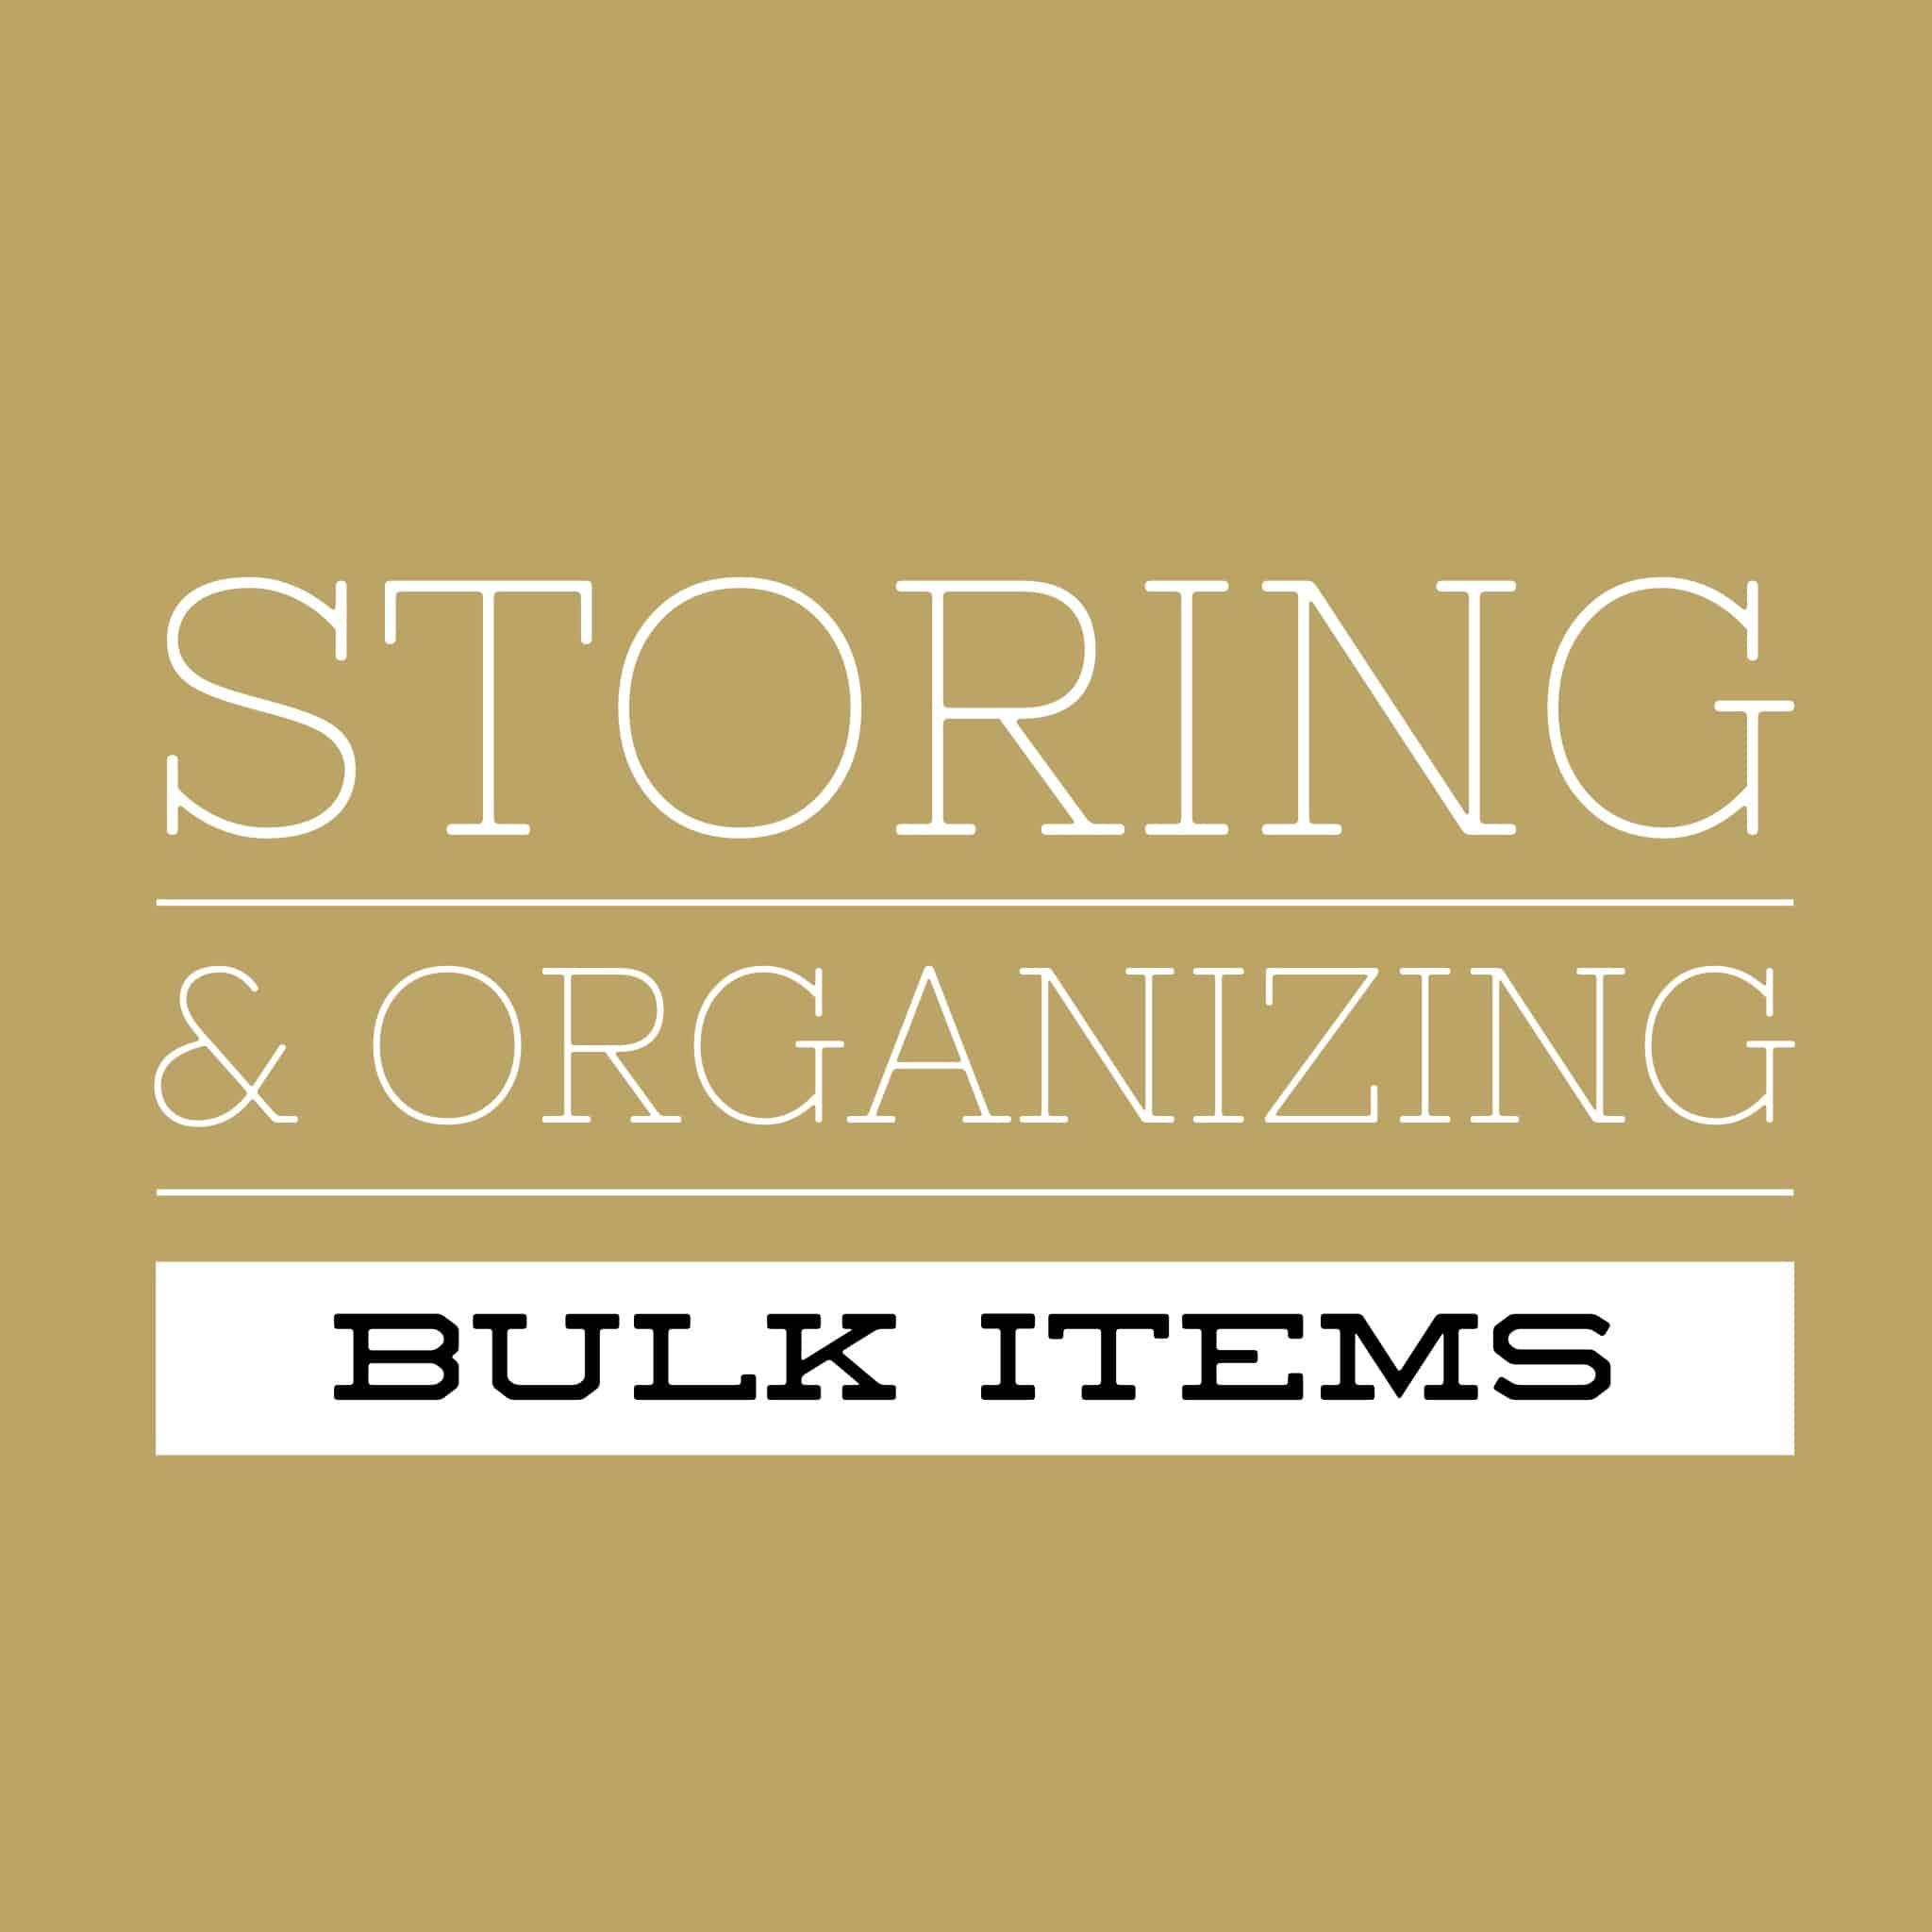 Storing & Organizing Bulk Items Title